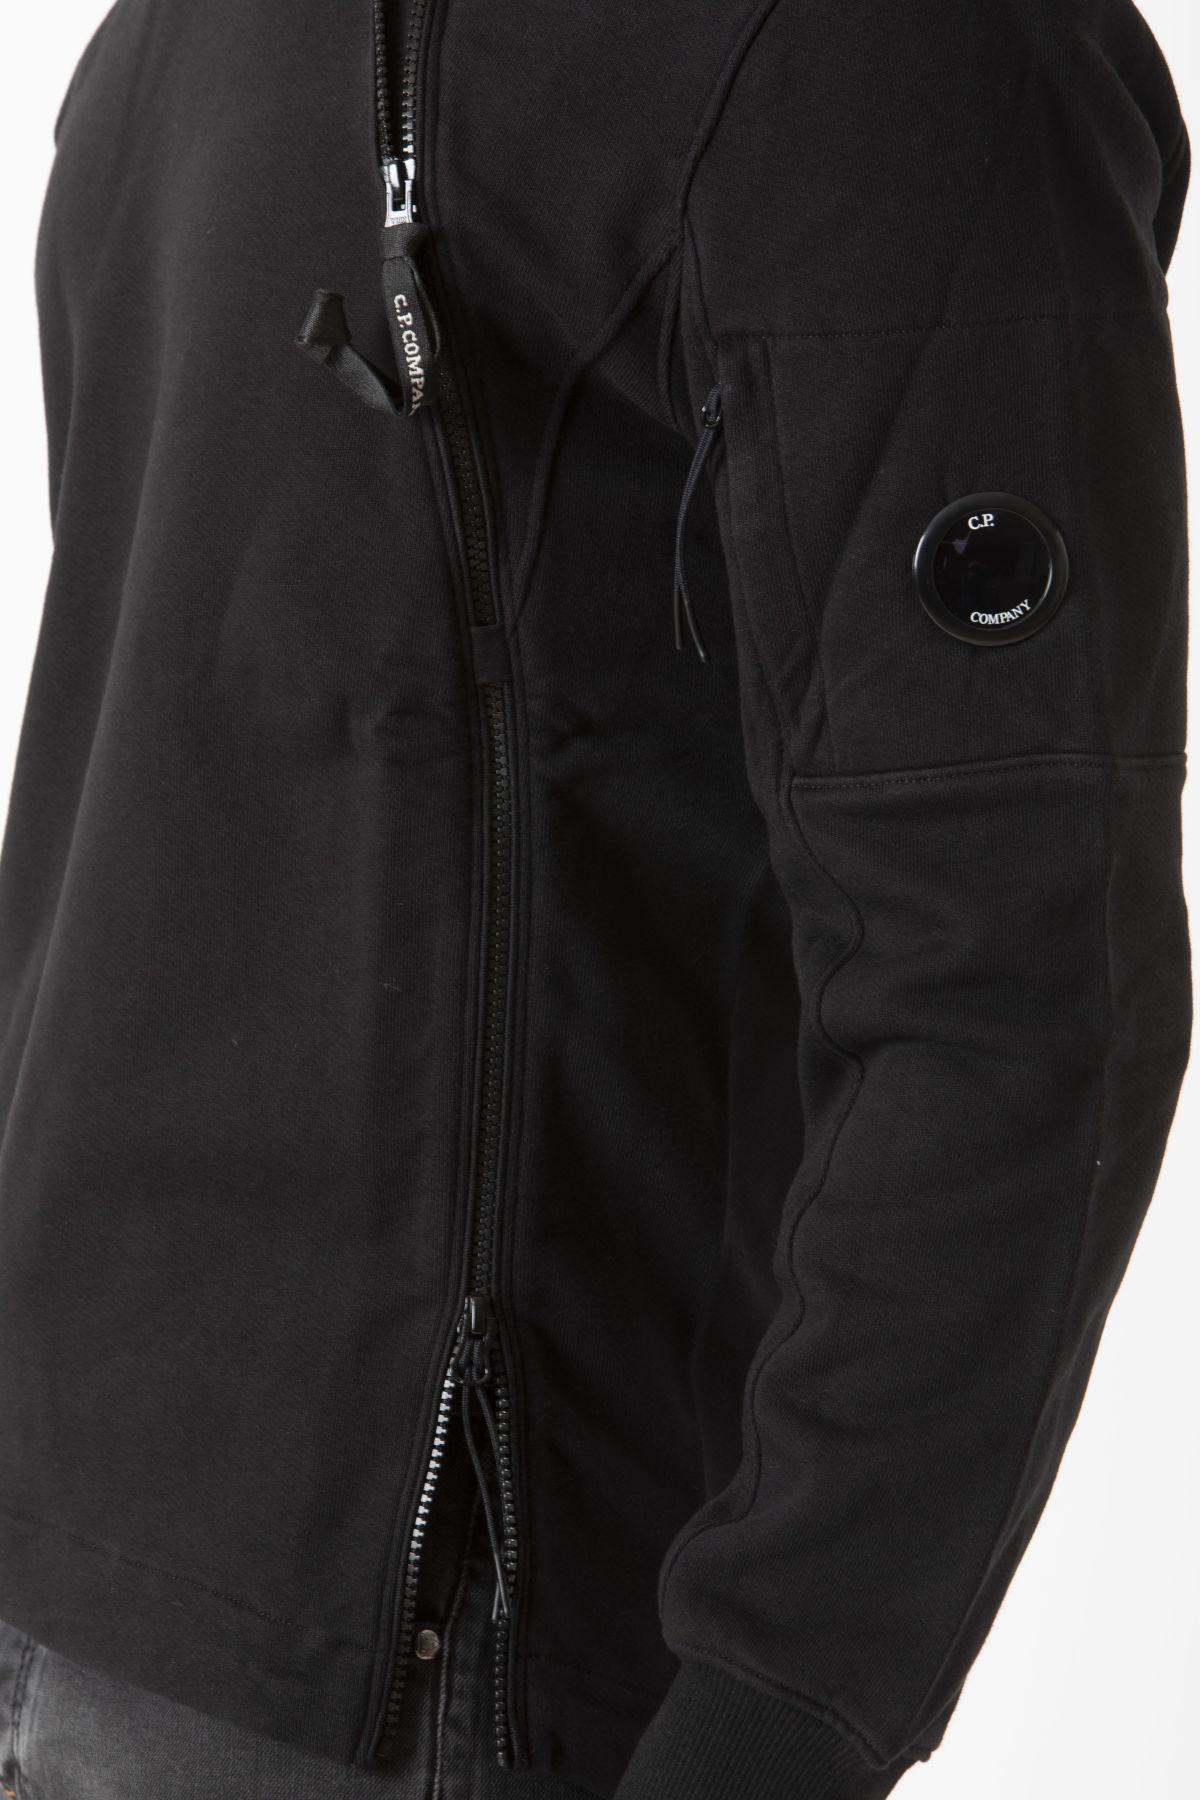 Sweatshirt for man C.P. COMPANY F/W